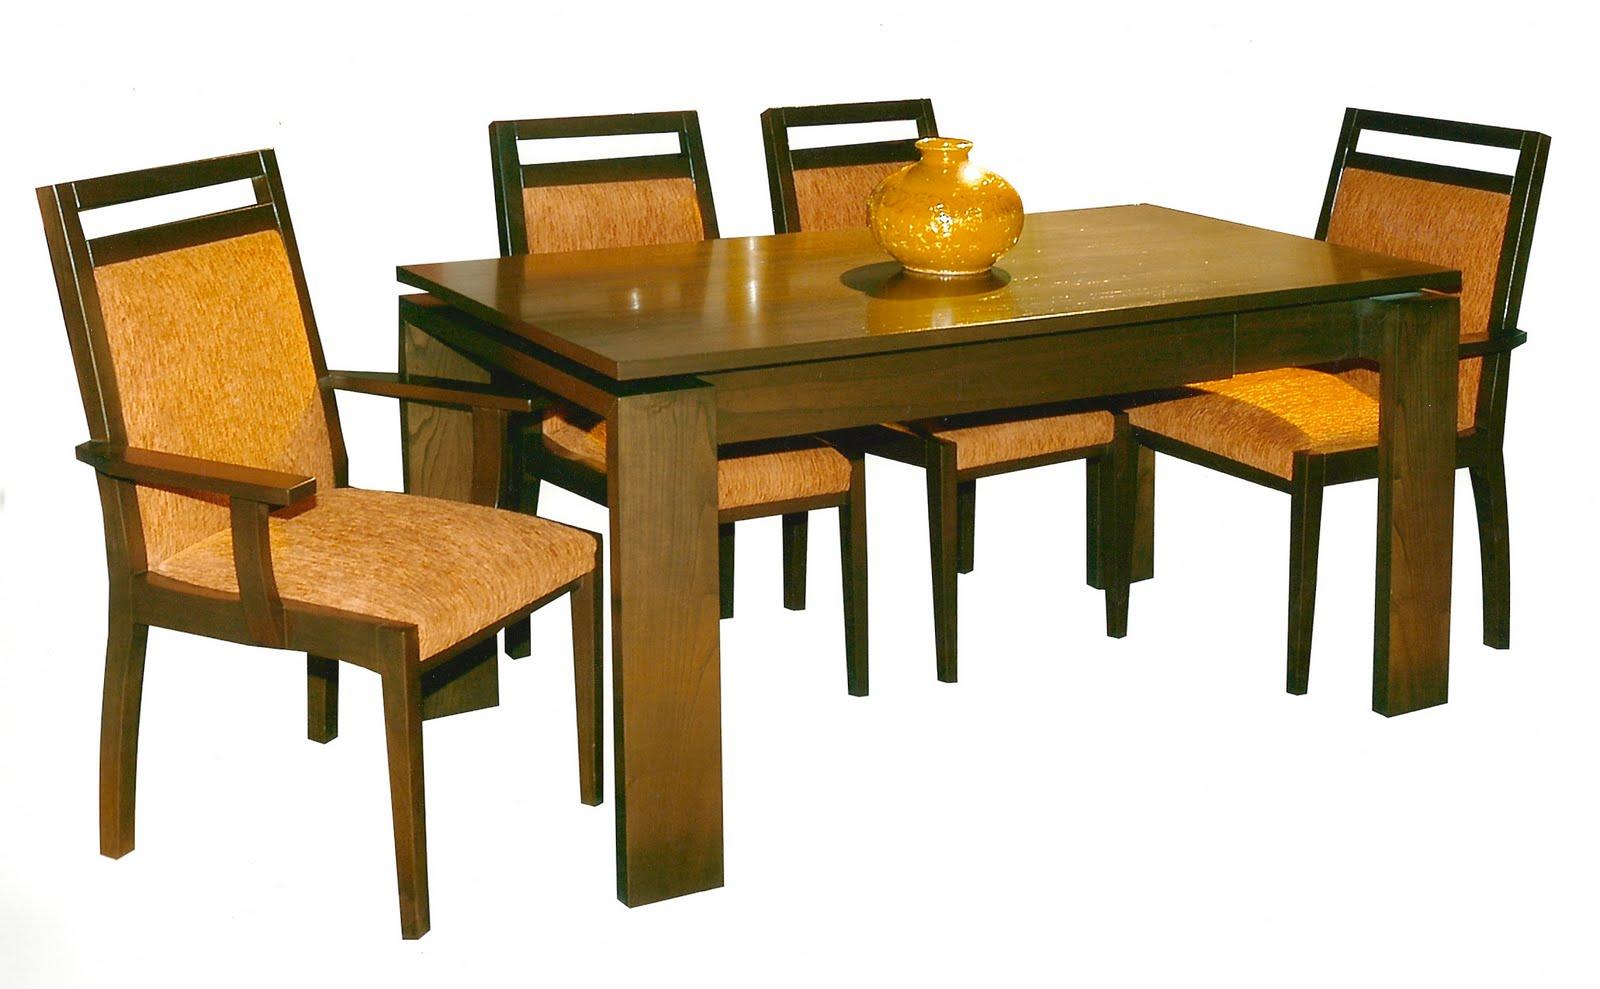 Muebles closet sillas camas estufas calefont for Mesas para muebles modernas